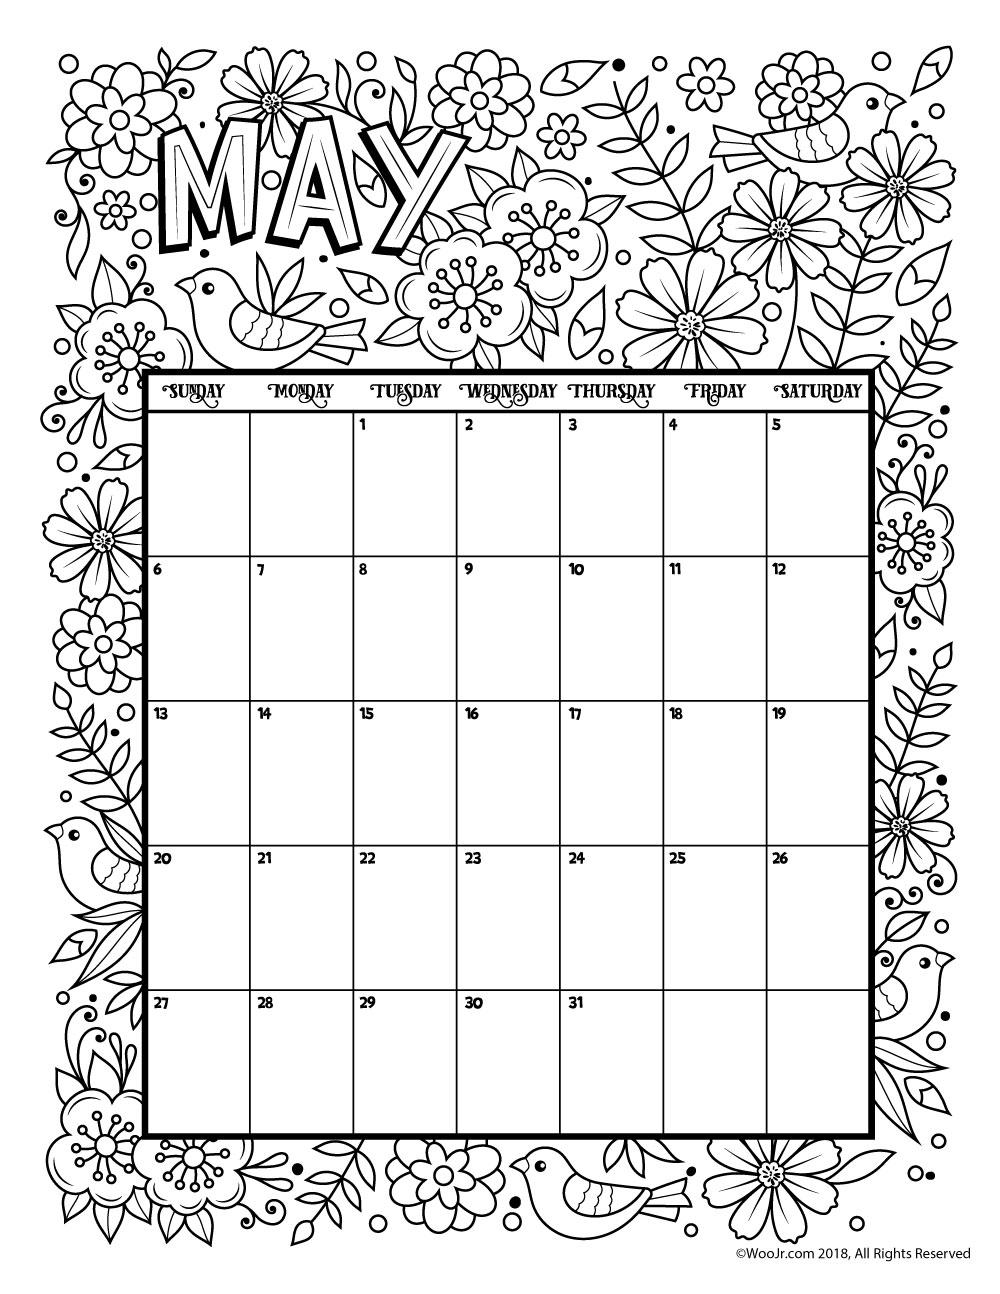 print may calendar 2018